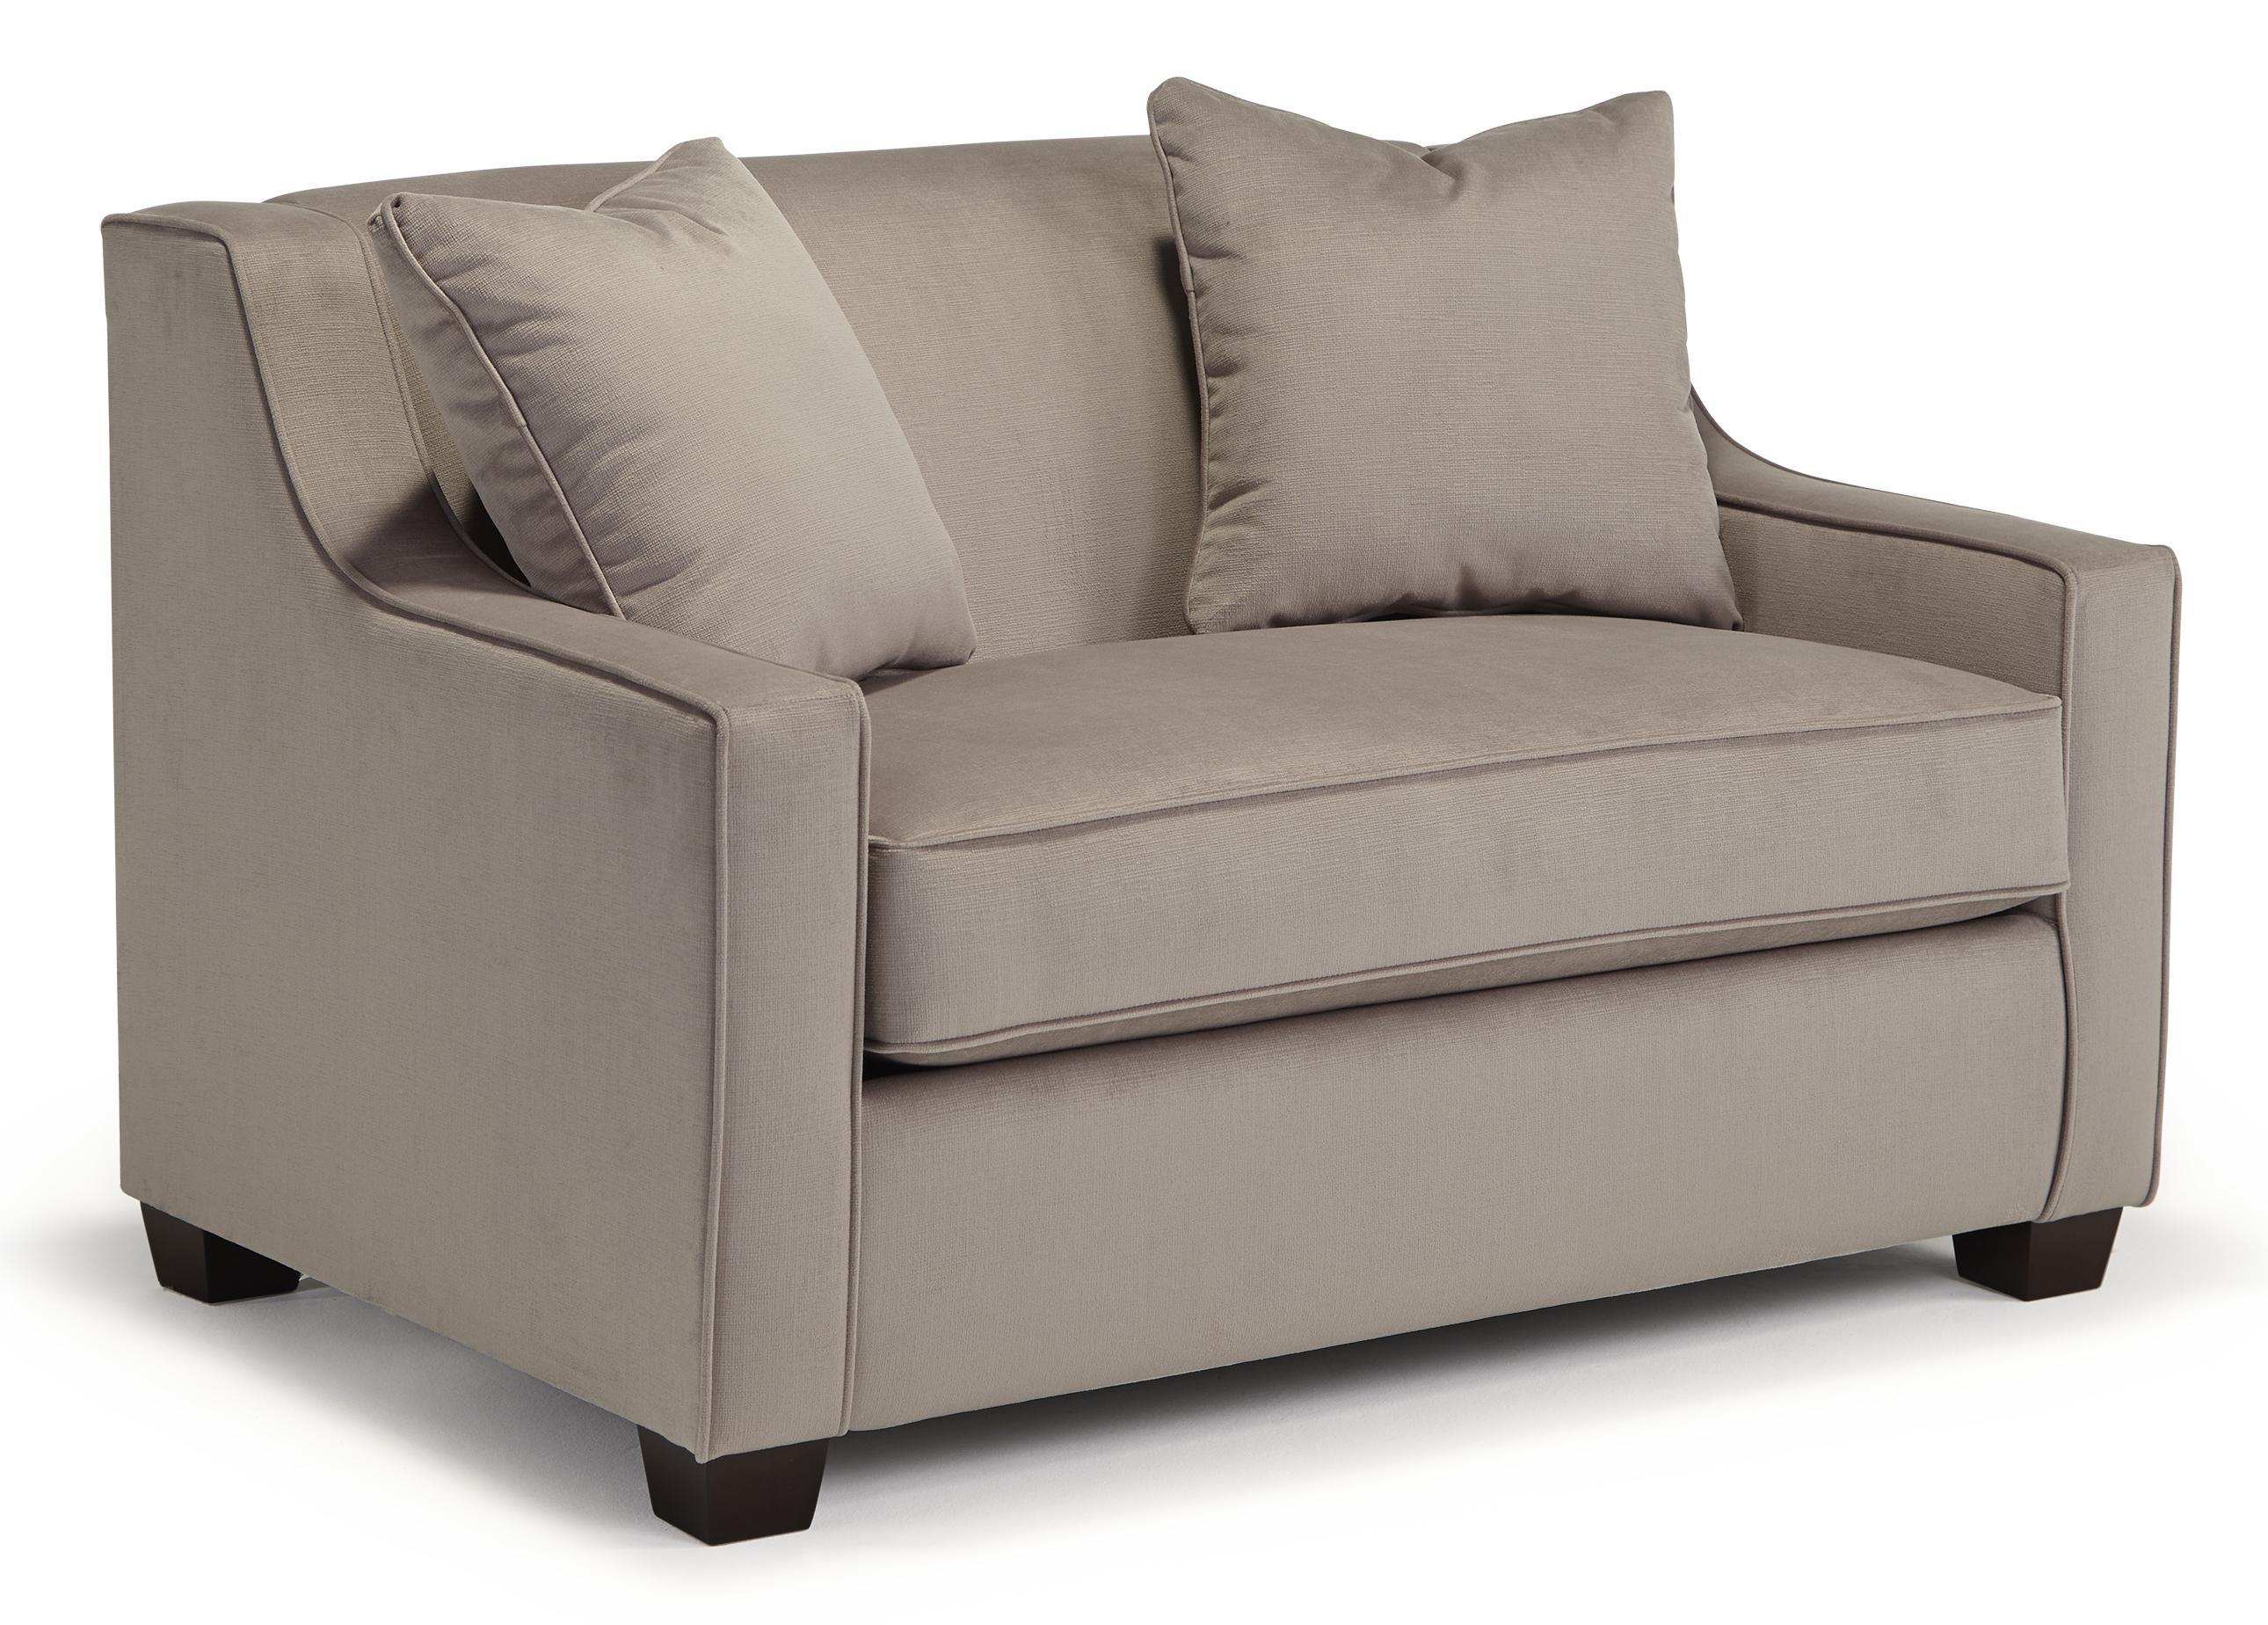 Marinette Twin Sleeper Chair w/ Memory Foam Mattress by Best Home Furnishings at Mueller Furniture